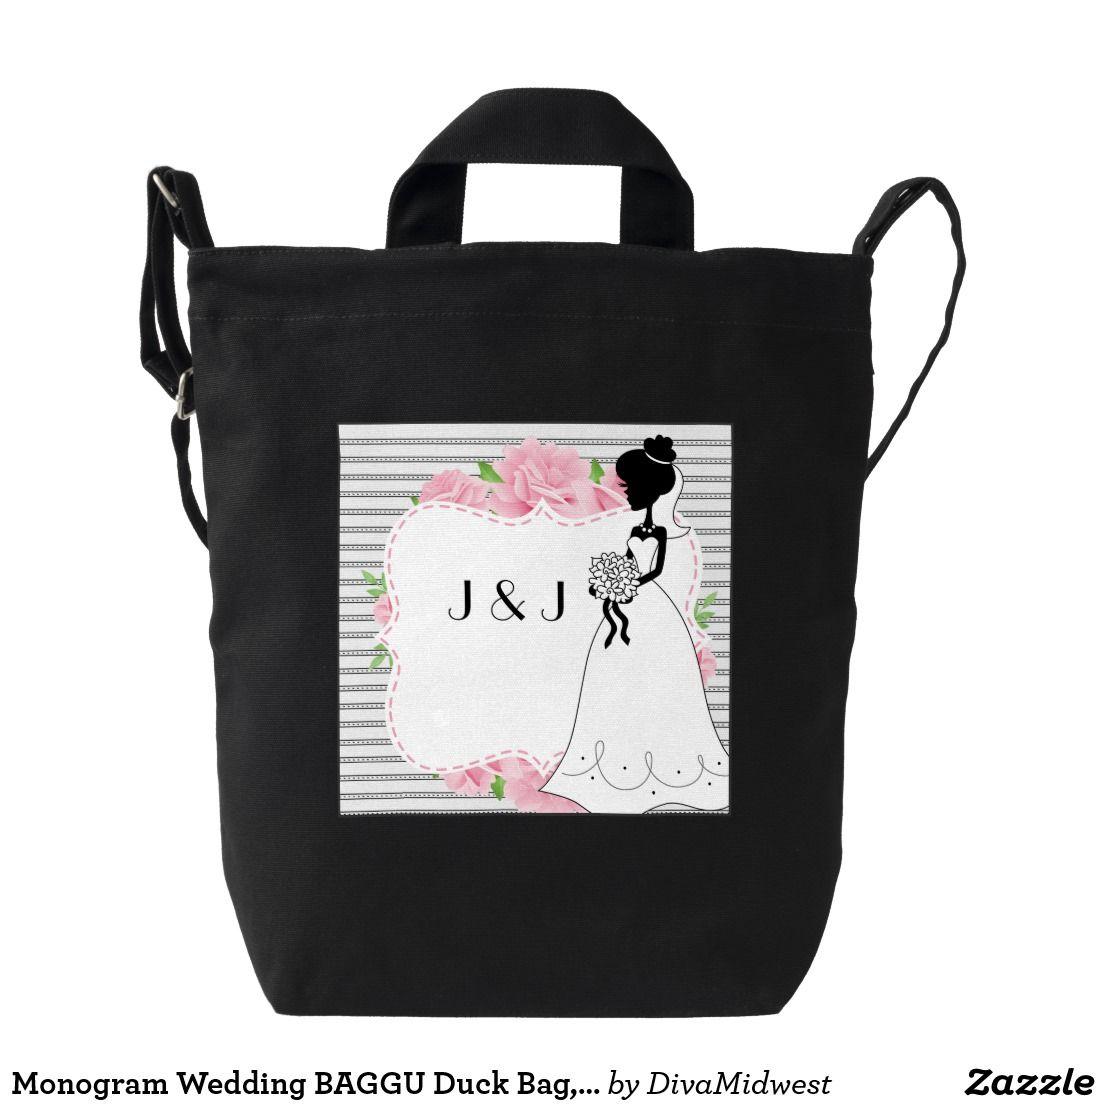 Monogram Wedding Baggu Duck Bag Black